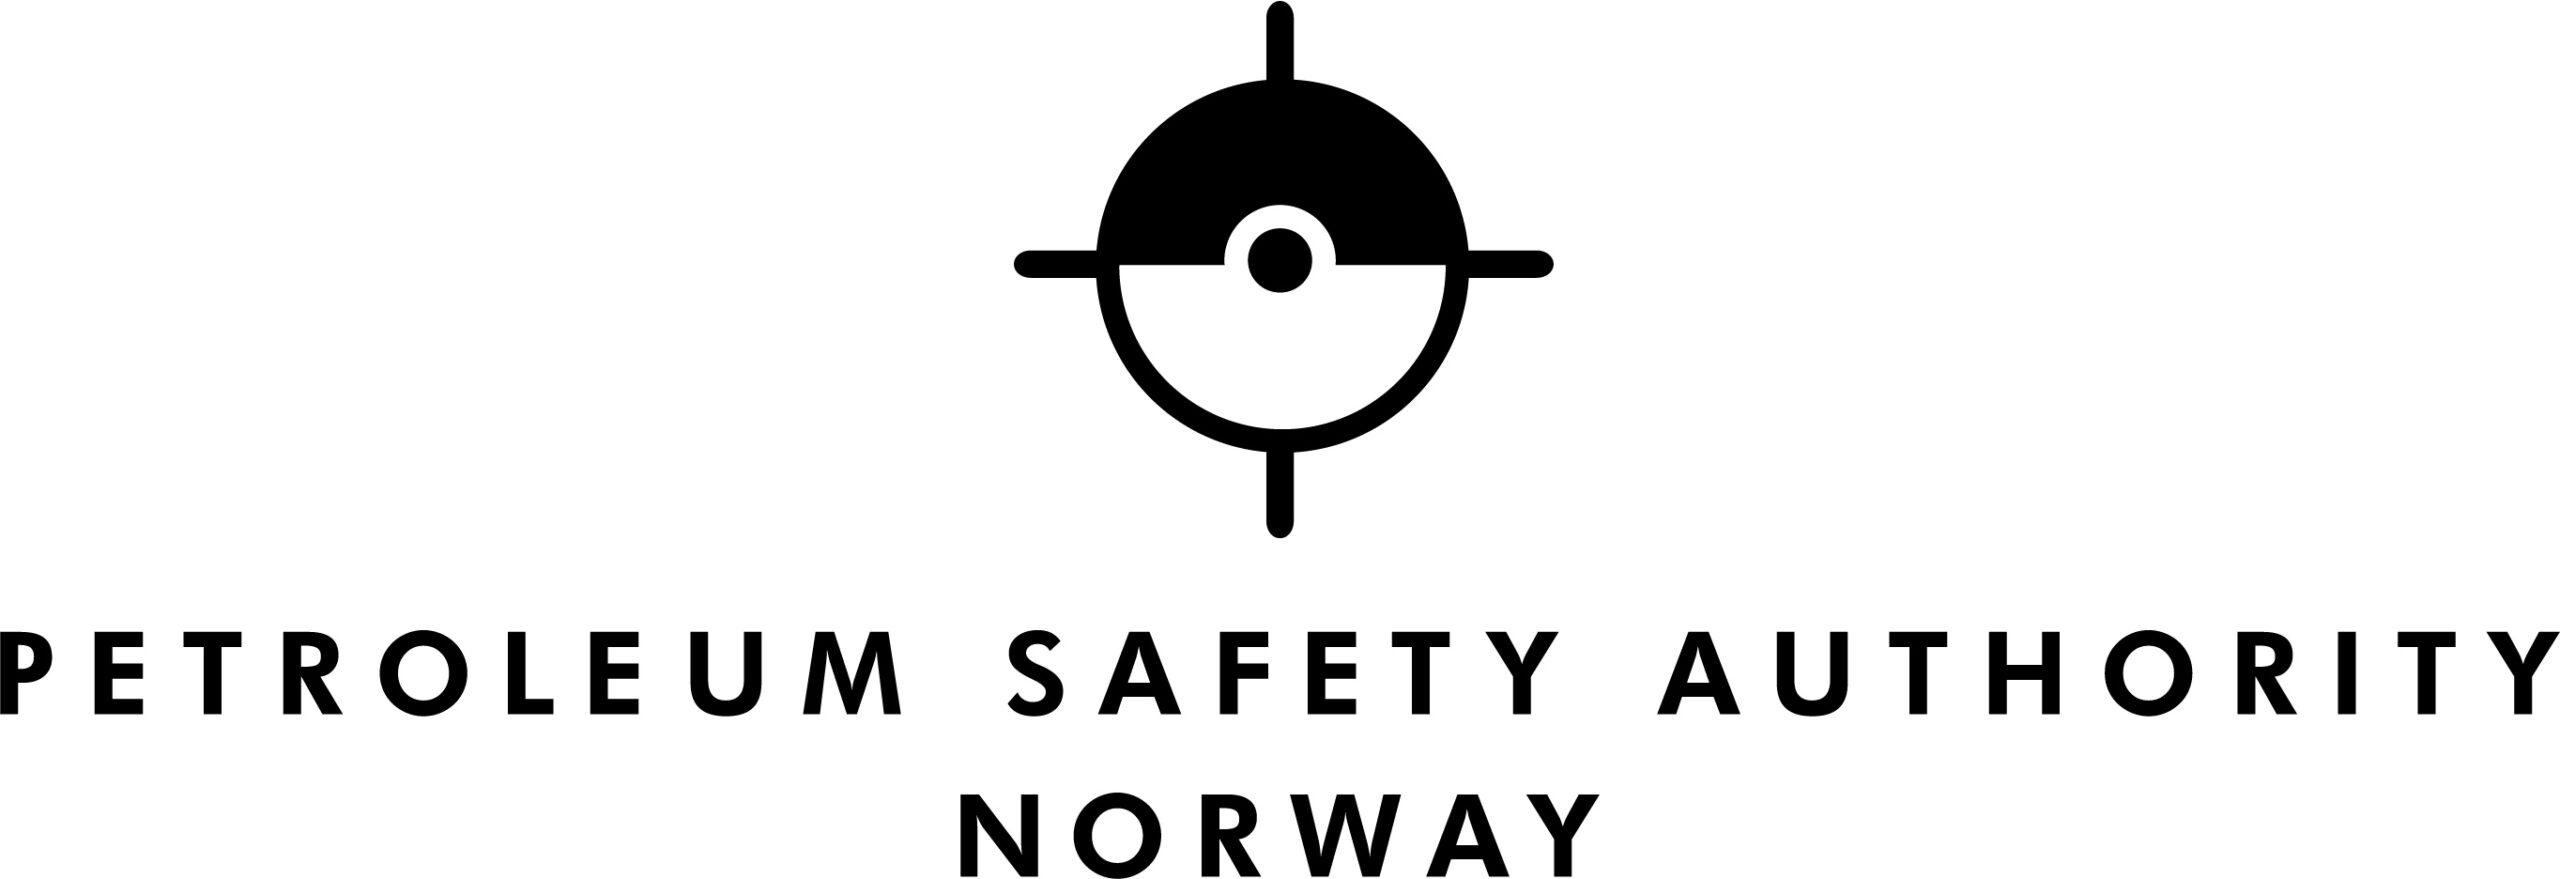 https://irfoffshoresafety.com/wp-content/uploads/2021/07/Psa-logo-2019-SORT-scaled.jpg